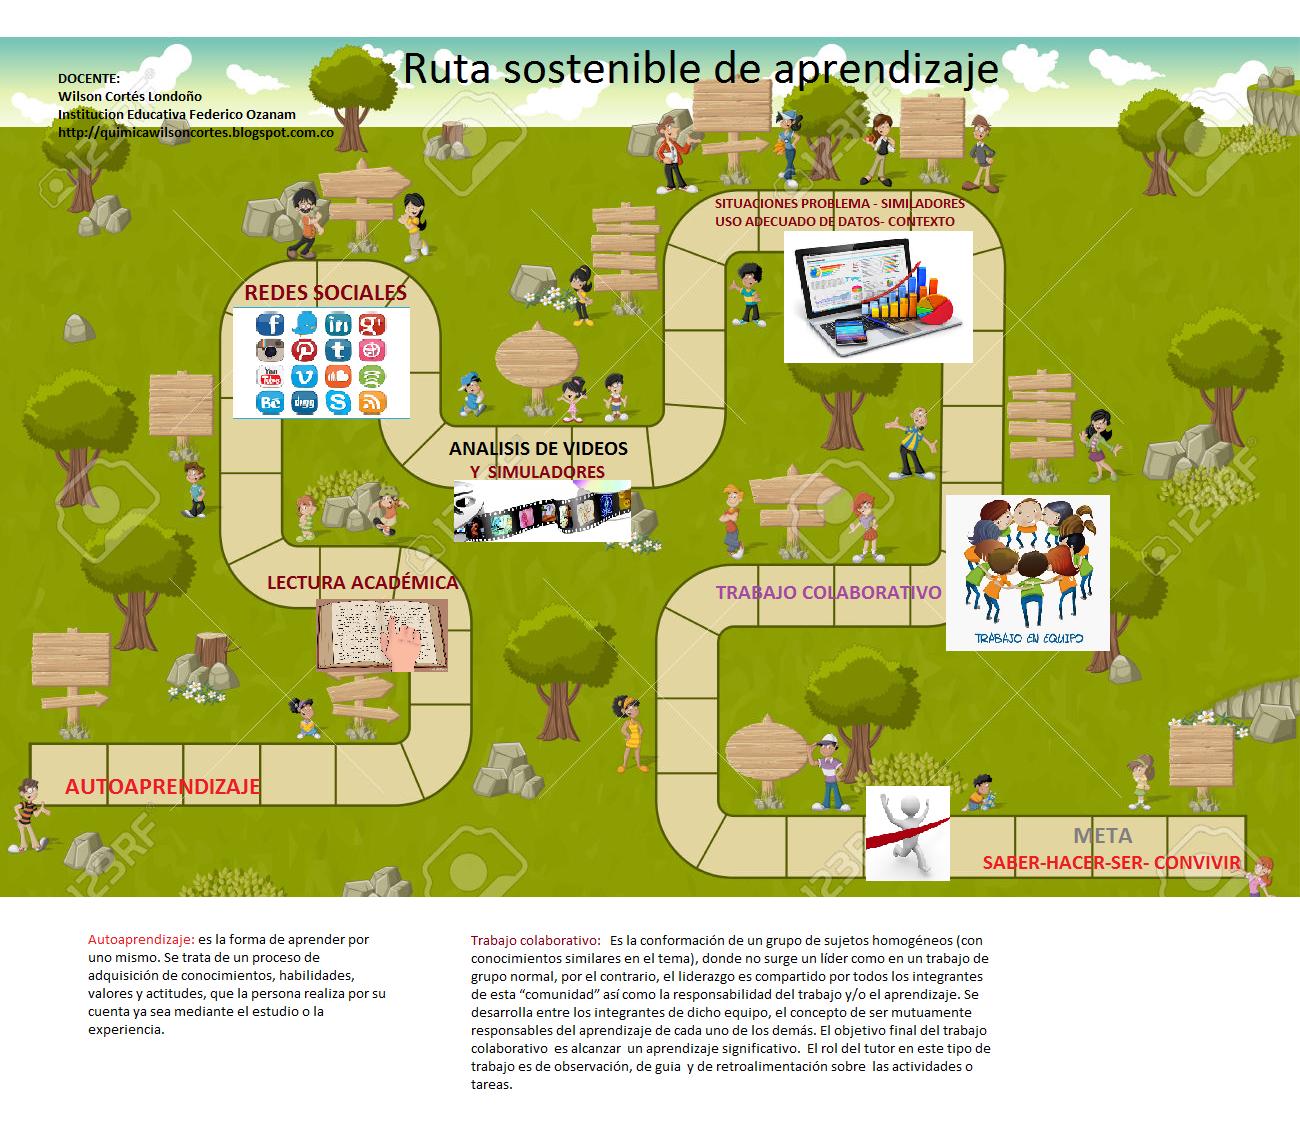 Ruta sostenible de aprendizaje